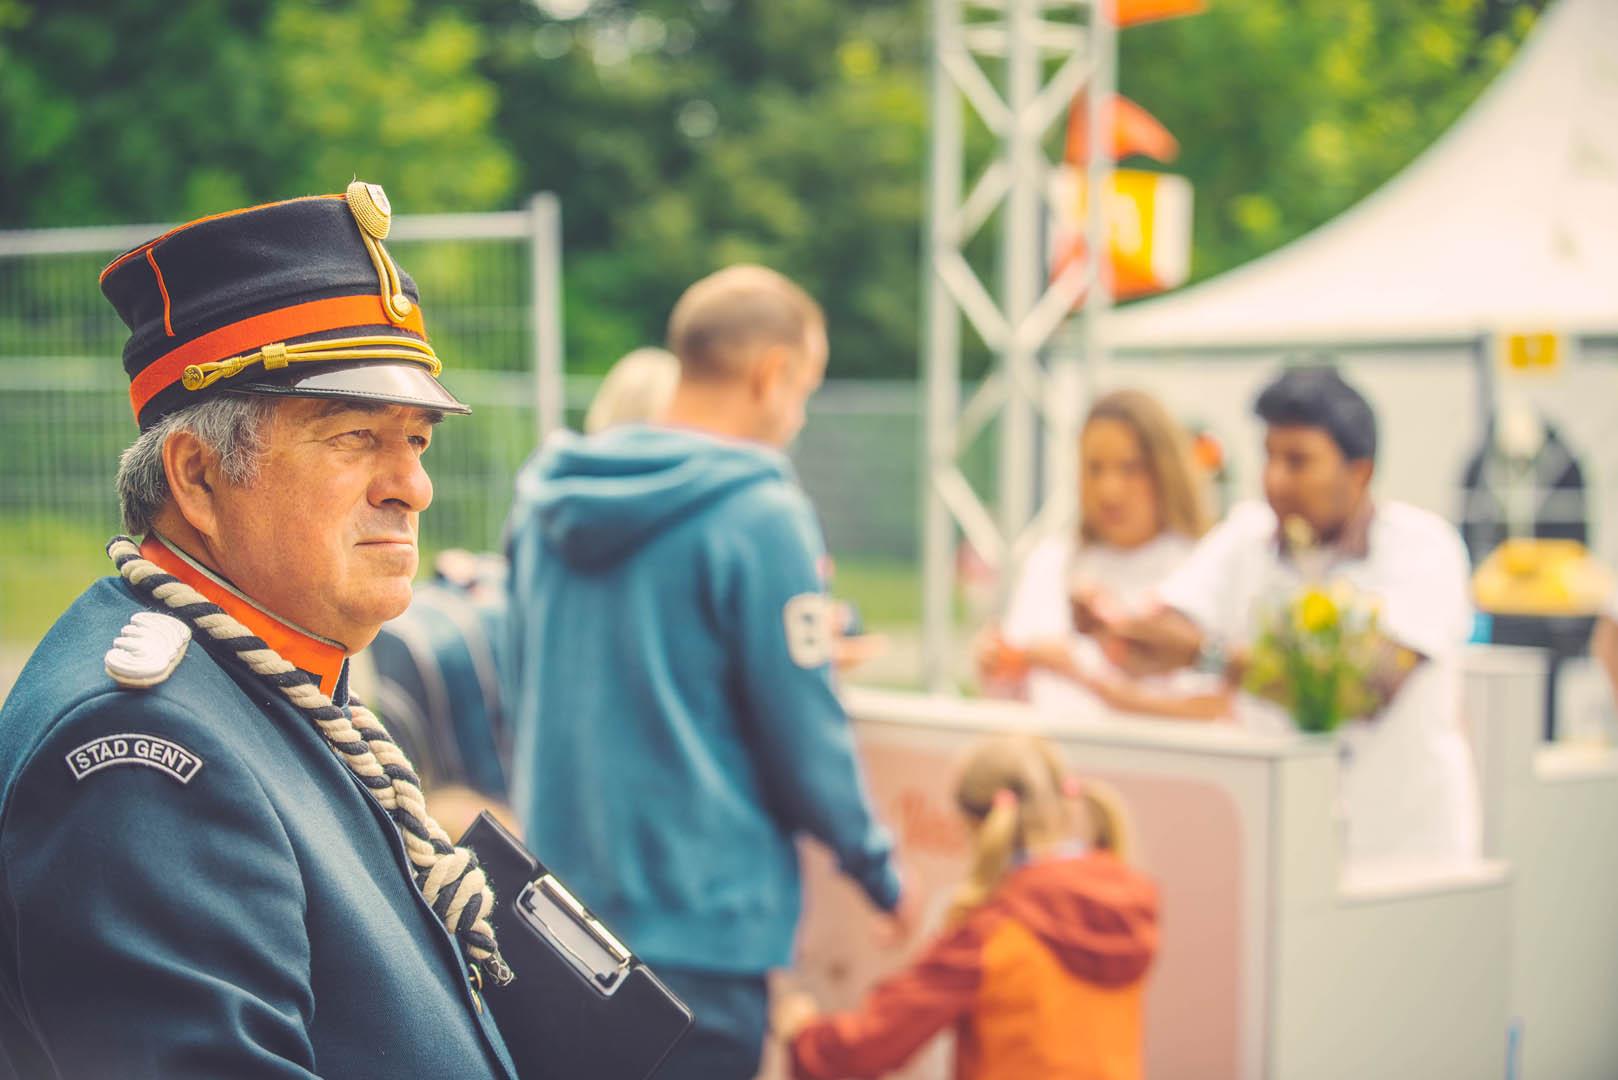 Stad Gent Picknick Event Omroeper